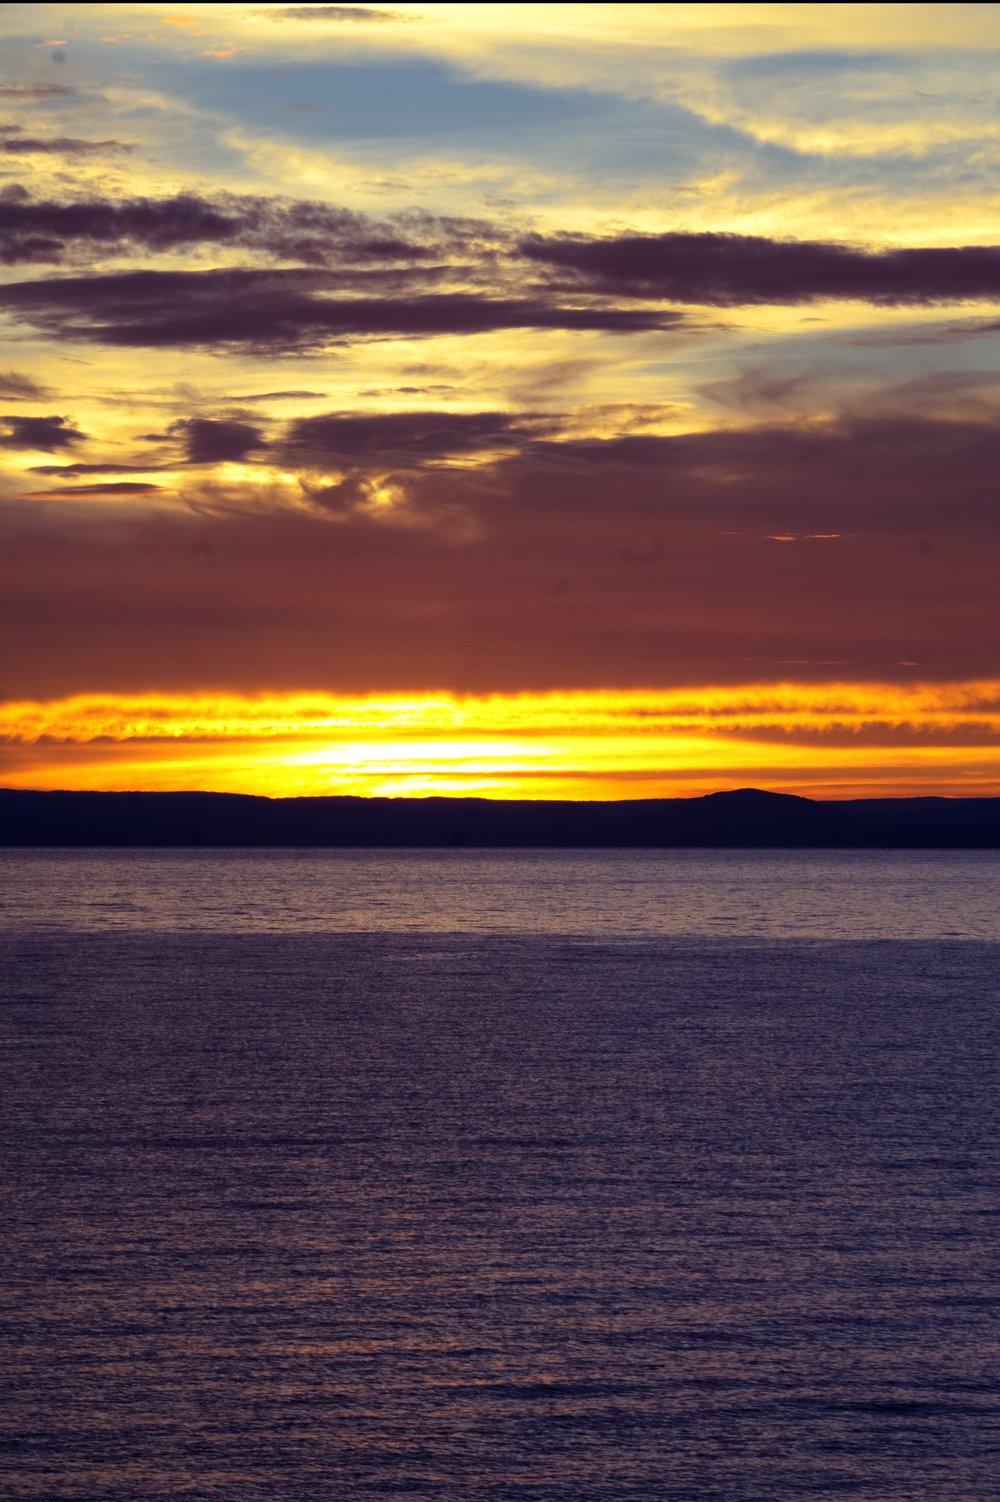 Mahale sunset 3.jpg